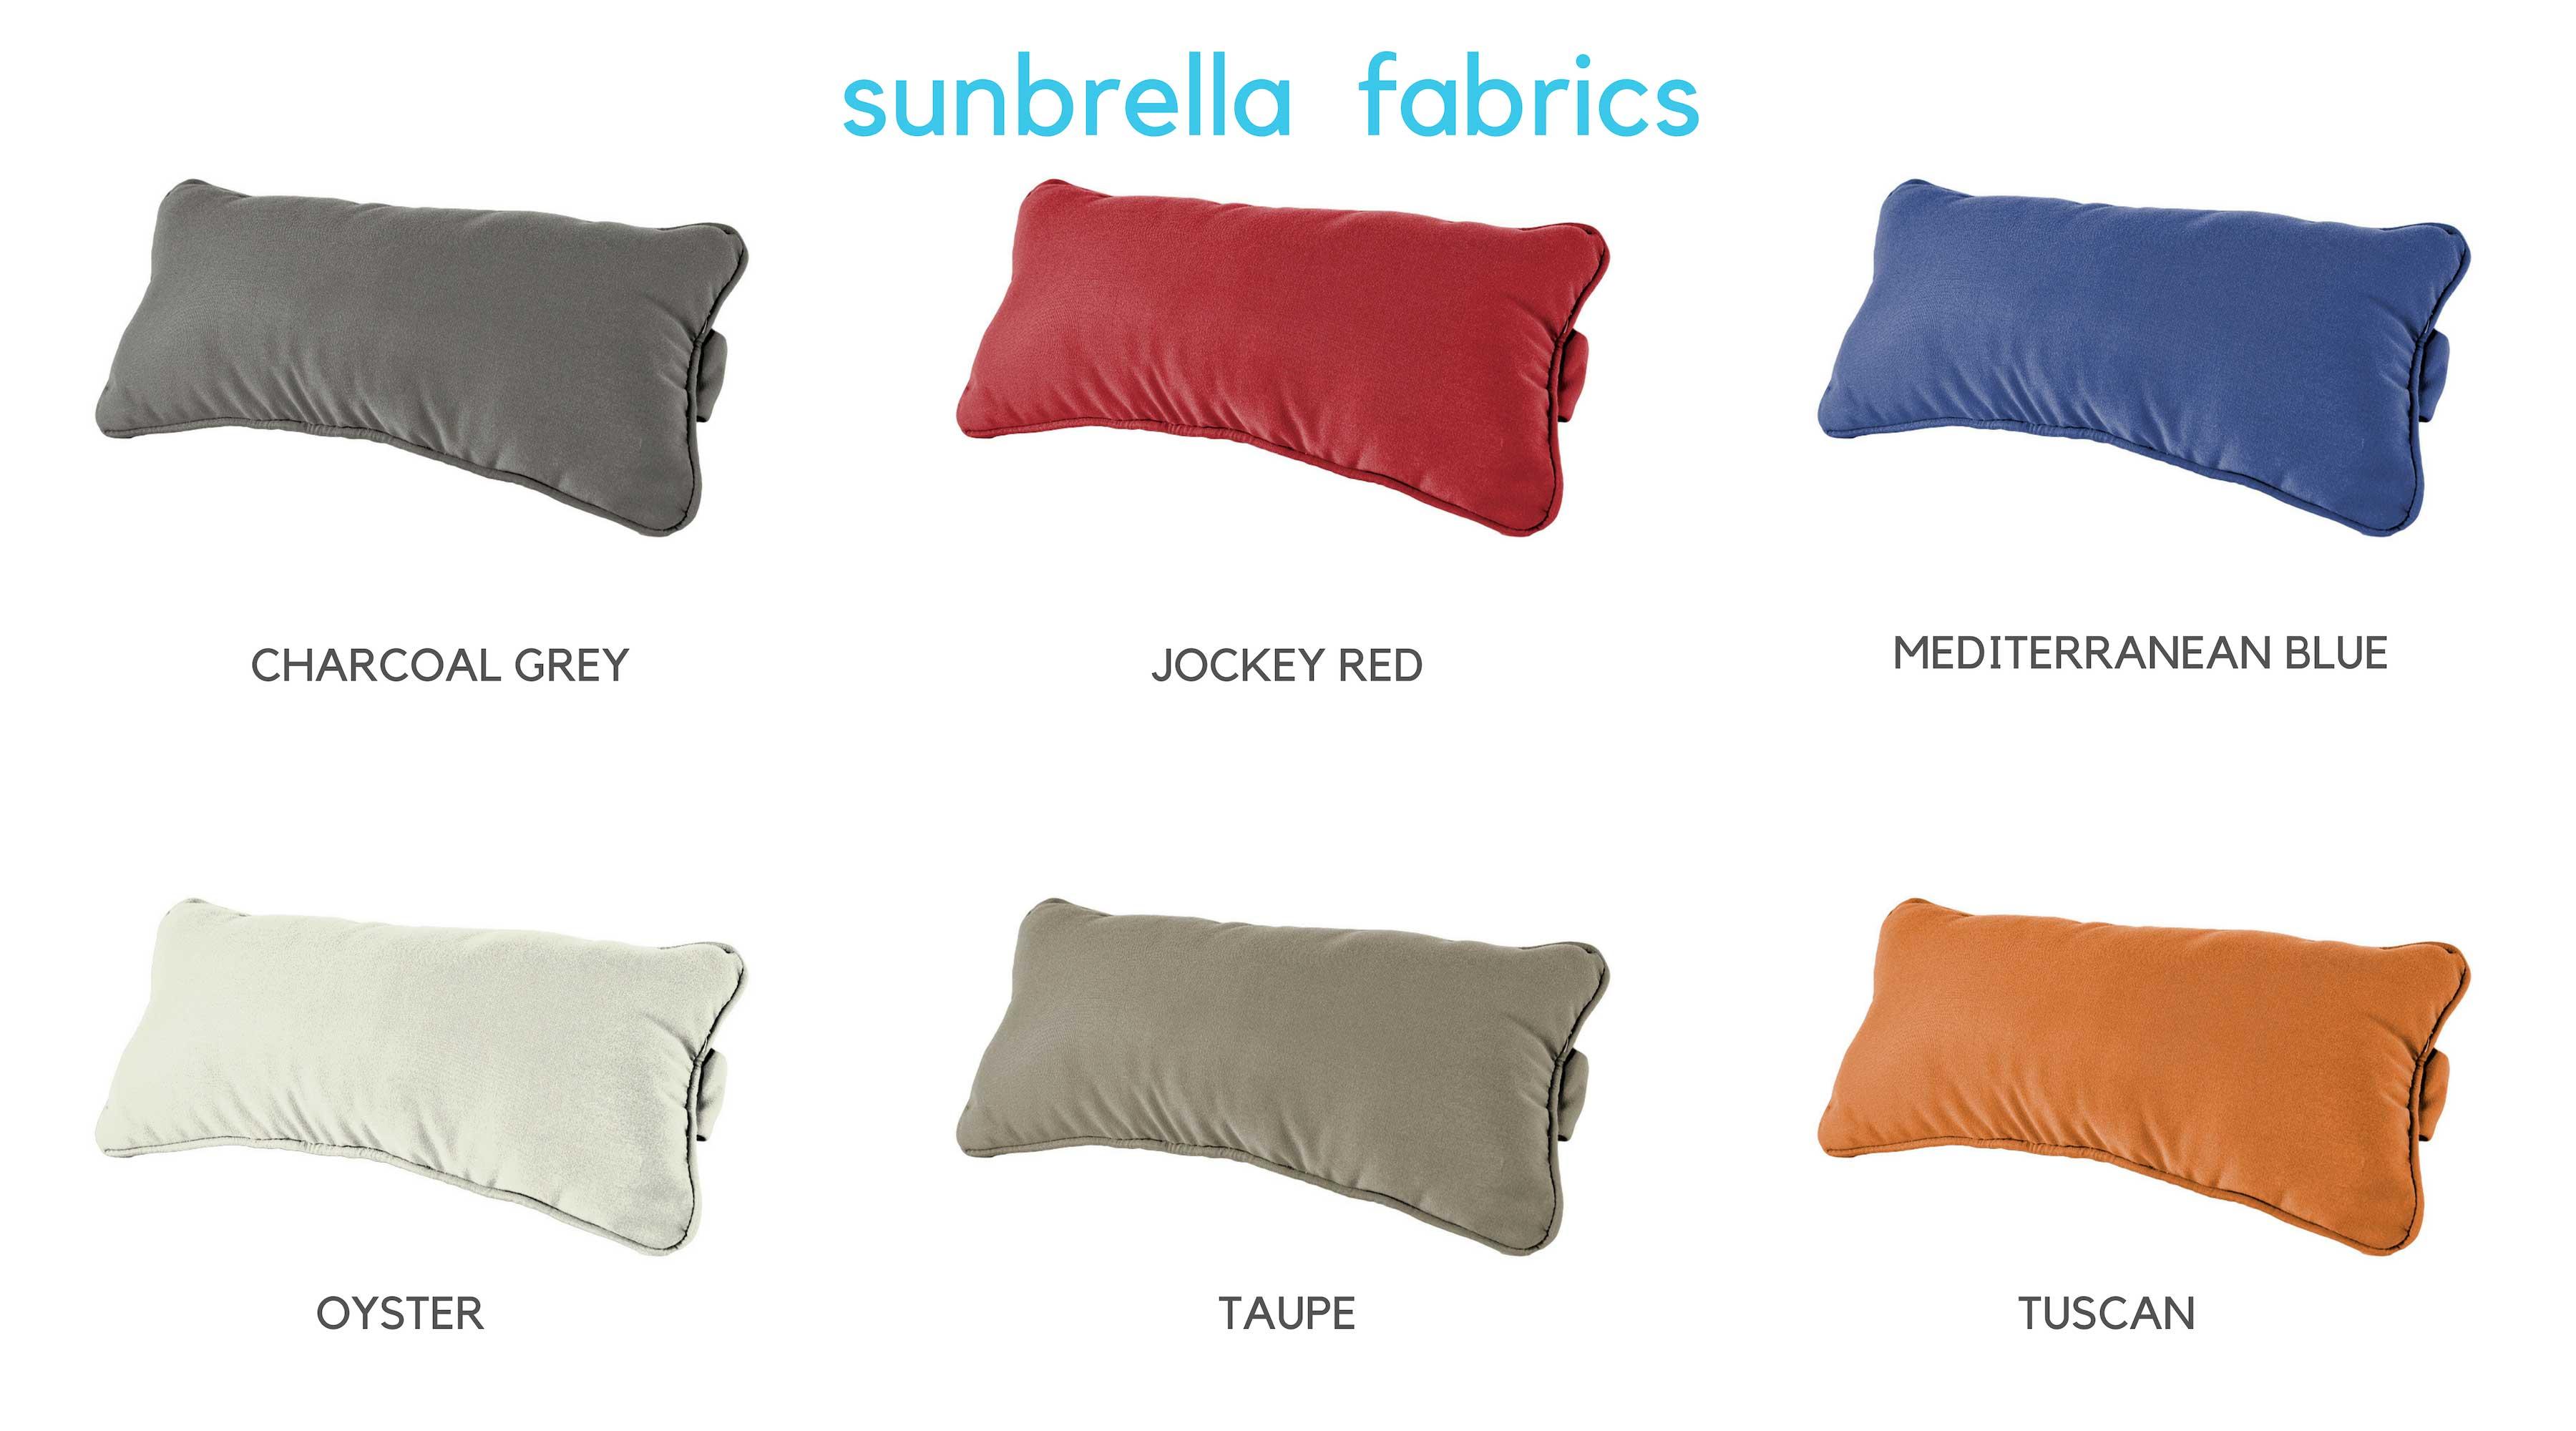 ledge-lounger-headrest-fabrics.jpg